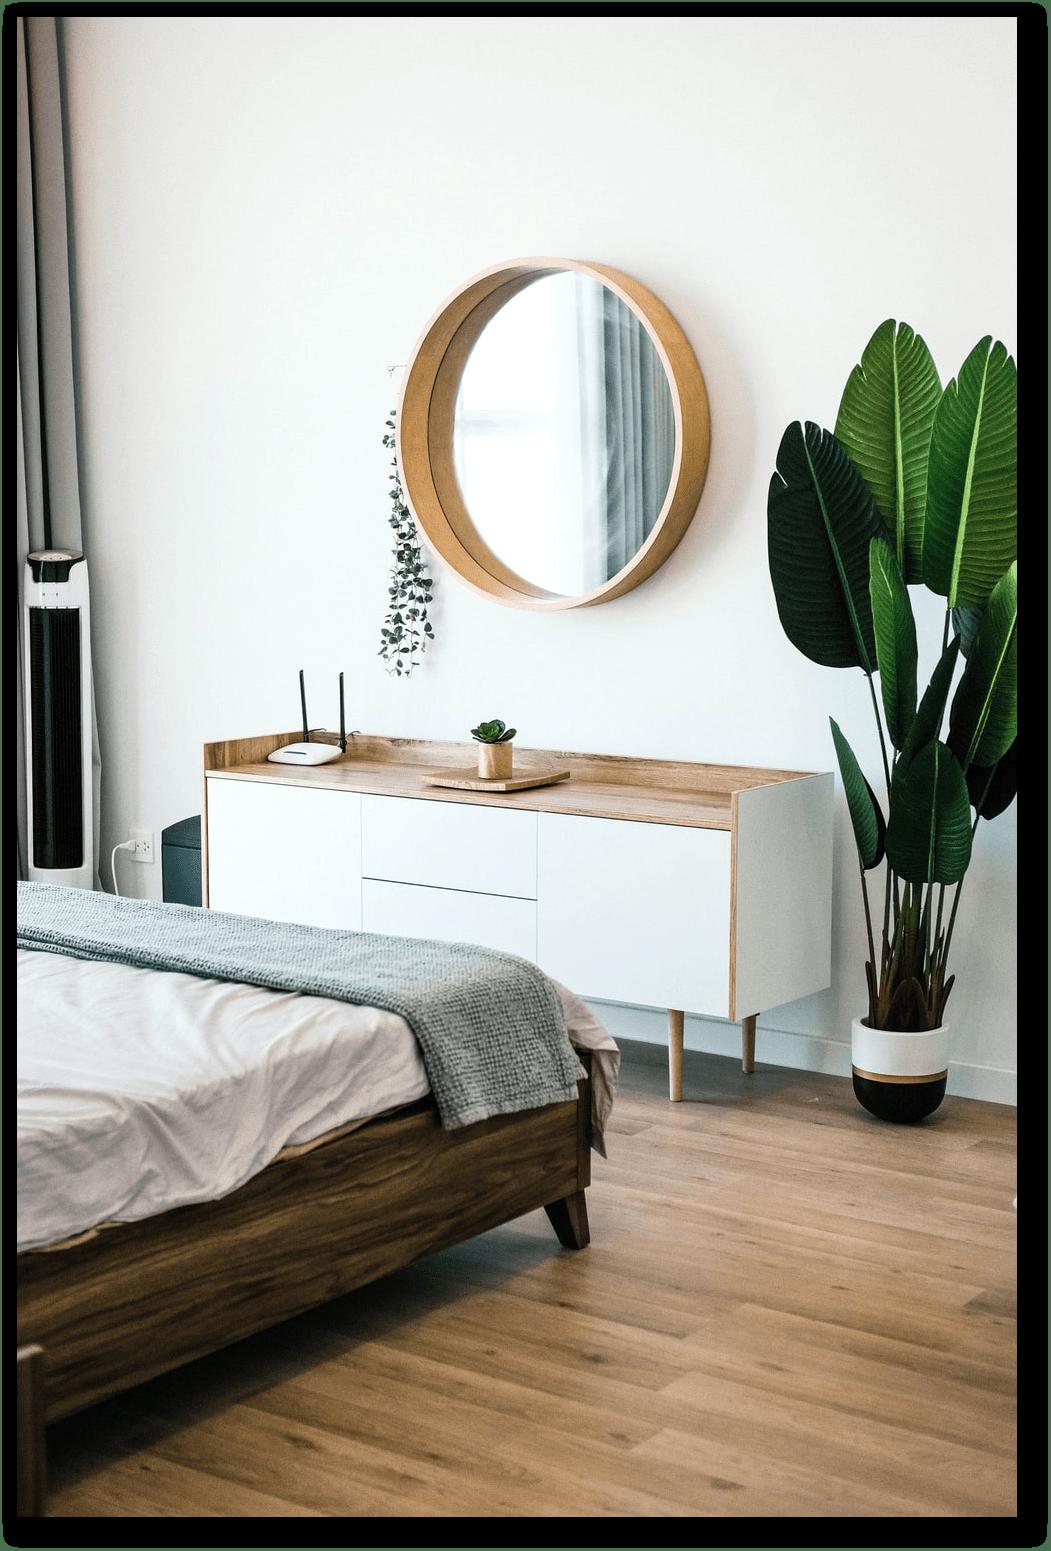 minimlistic bedroom design